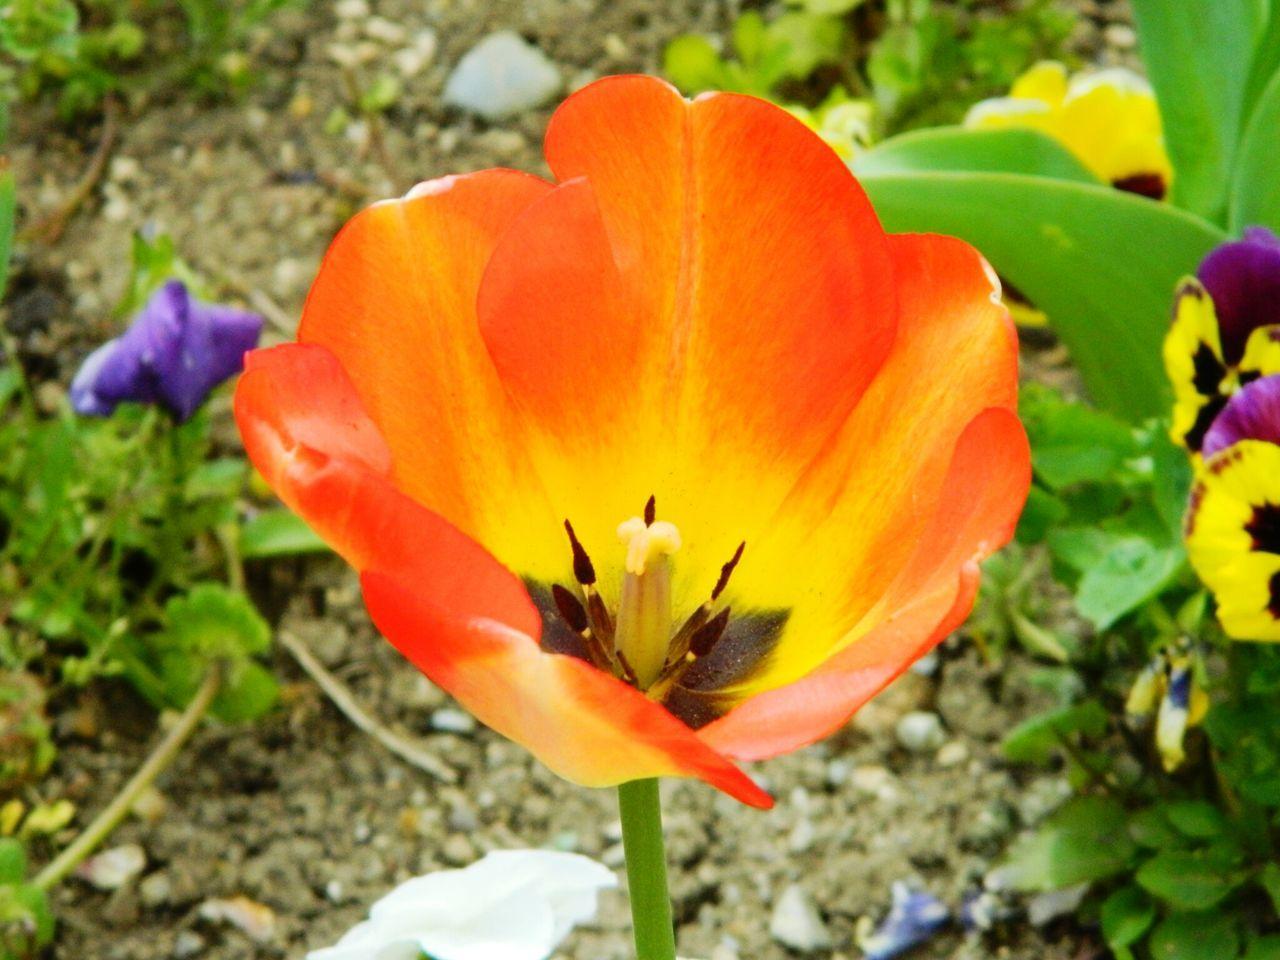 Close-Up Of Orange Flower Growing On Field